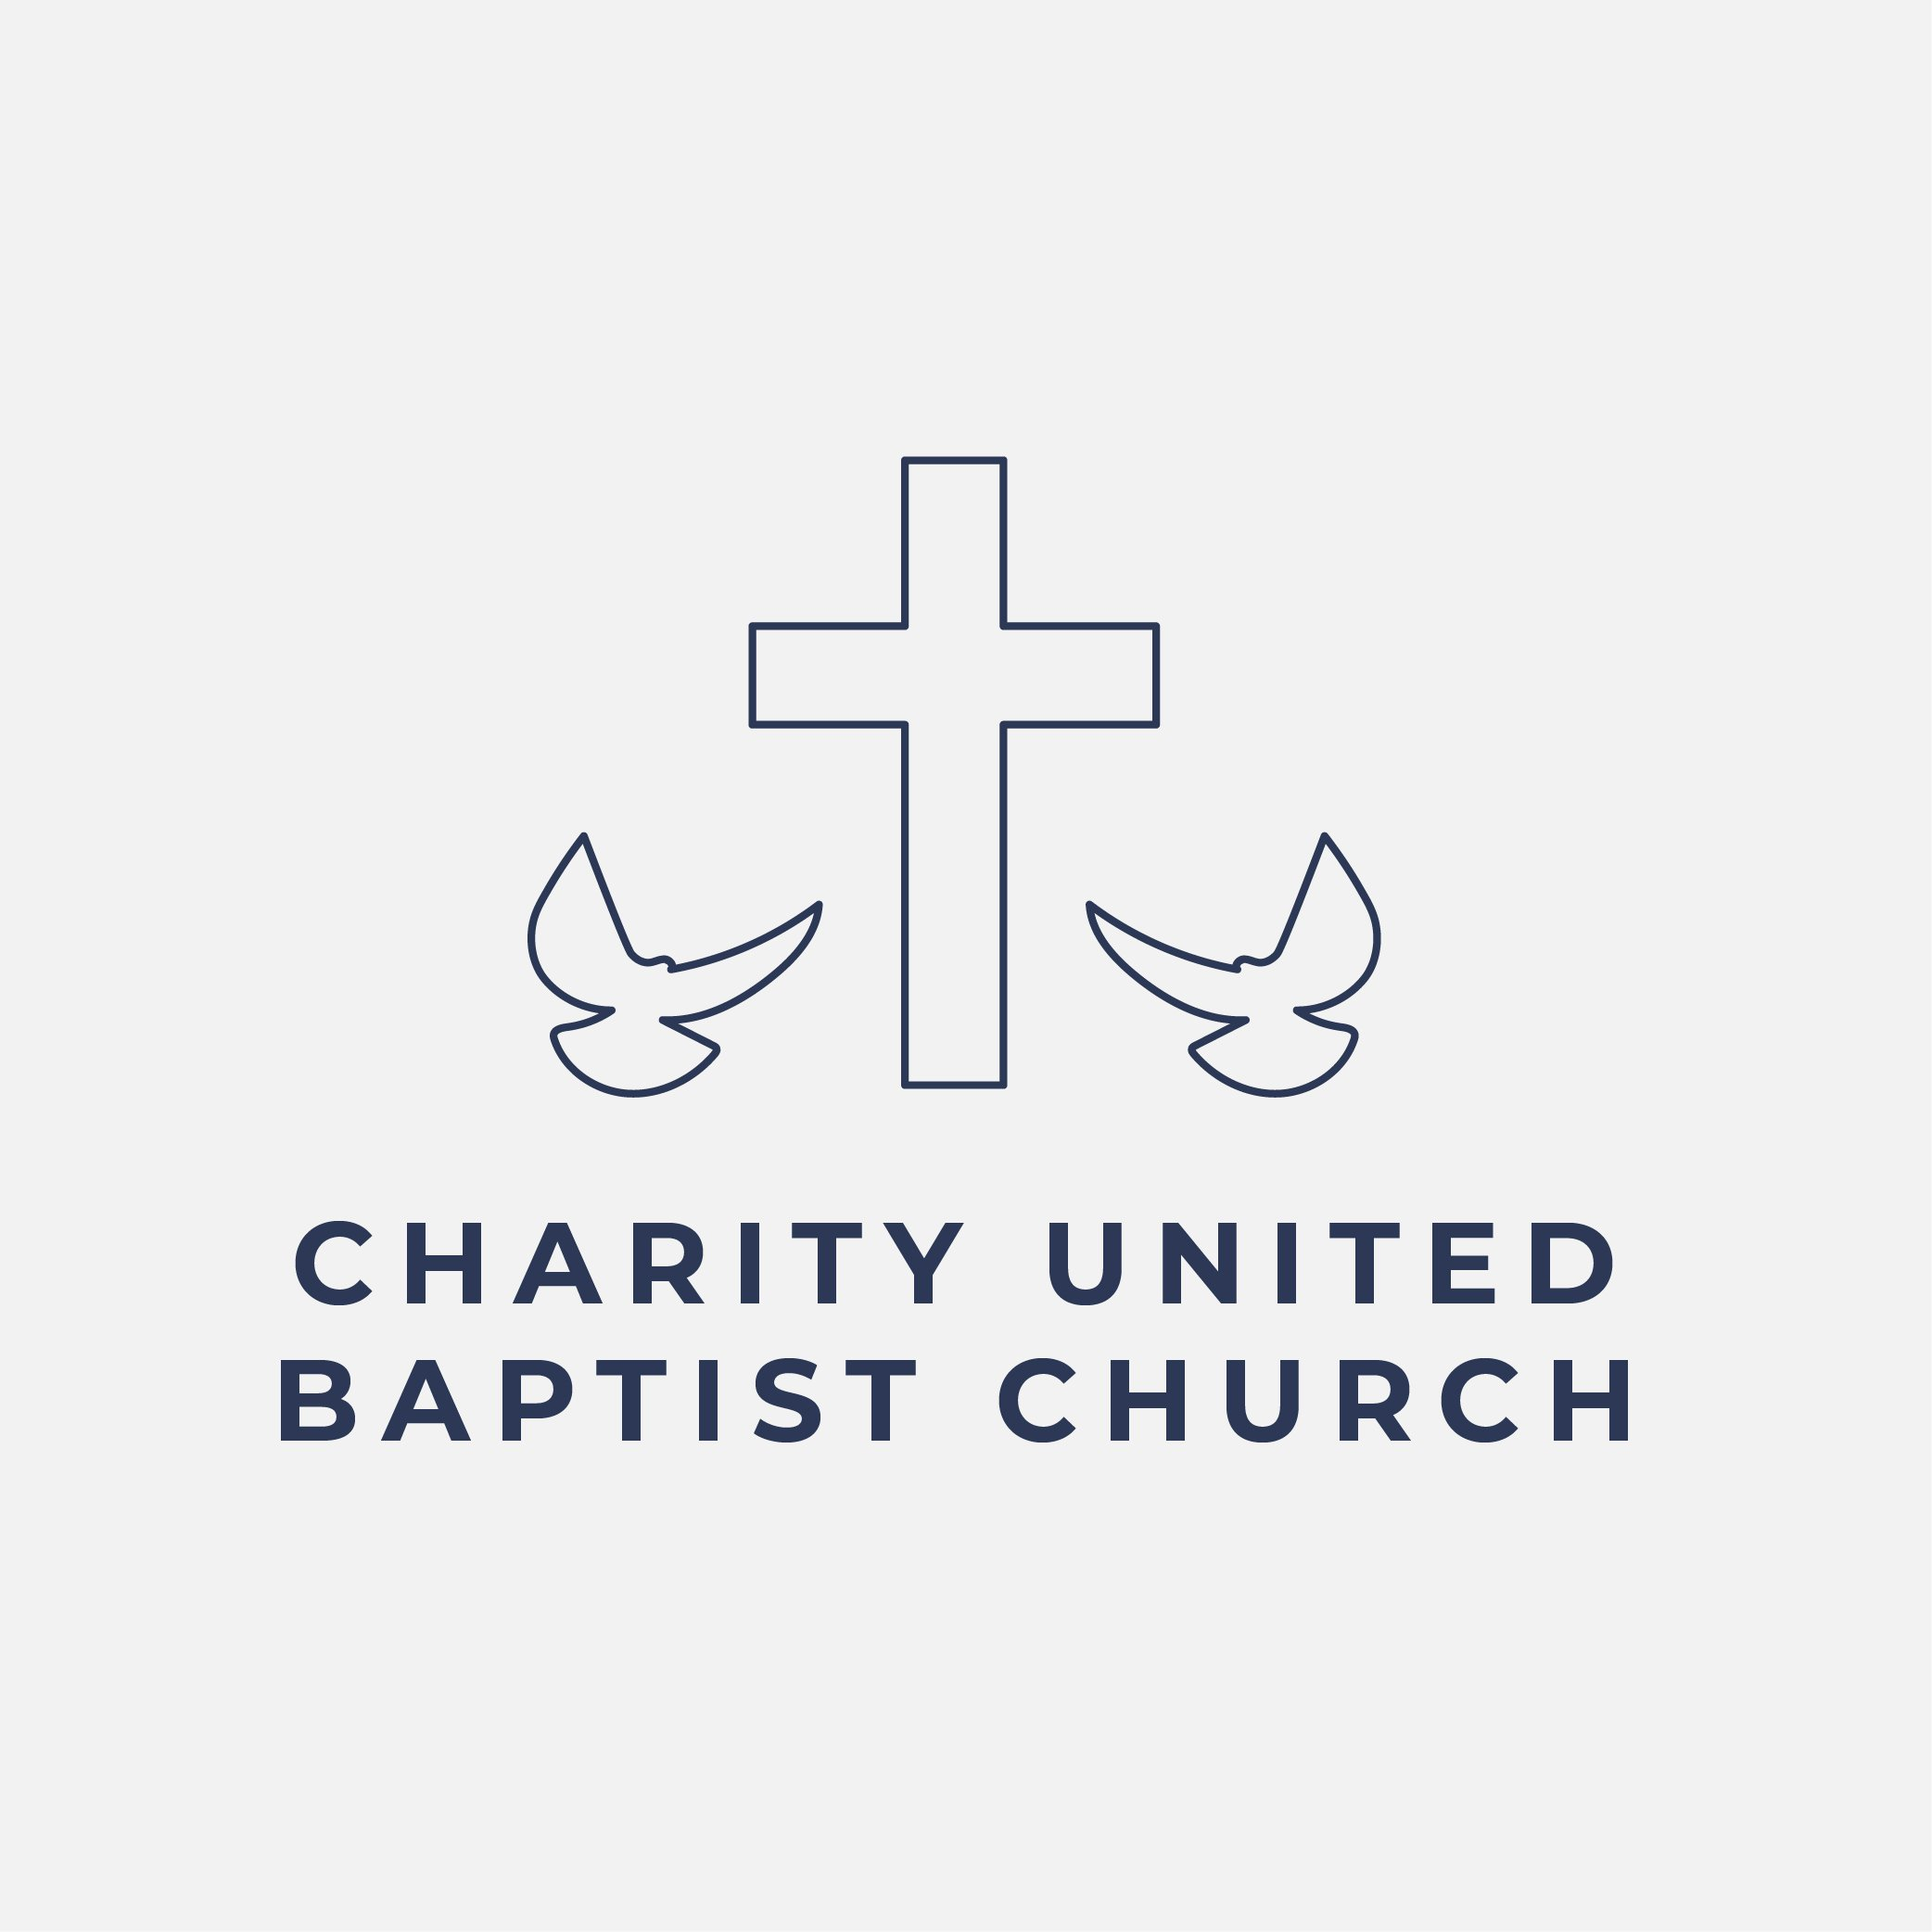 Charity United Baptist Church